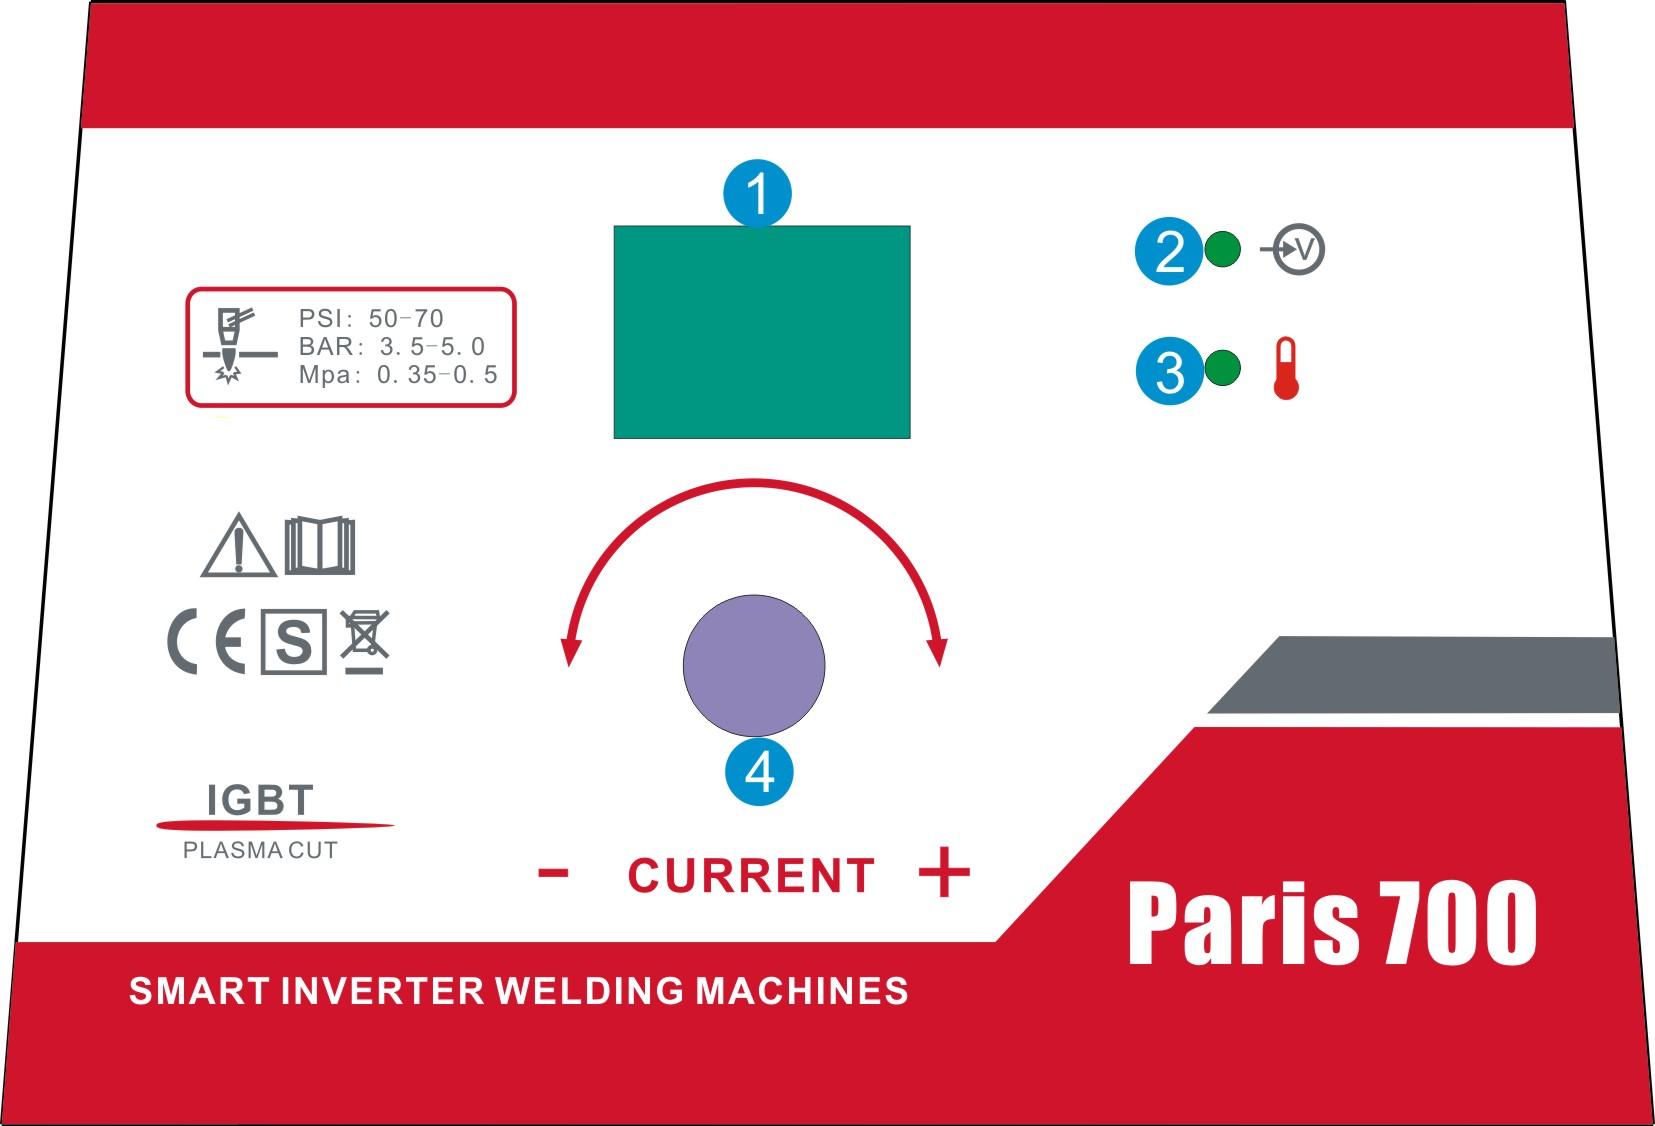 Paris 700 Cortadora de plasma profesional 70A, IGBT, HF, 20 mm